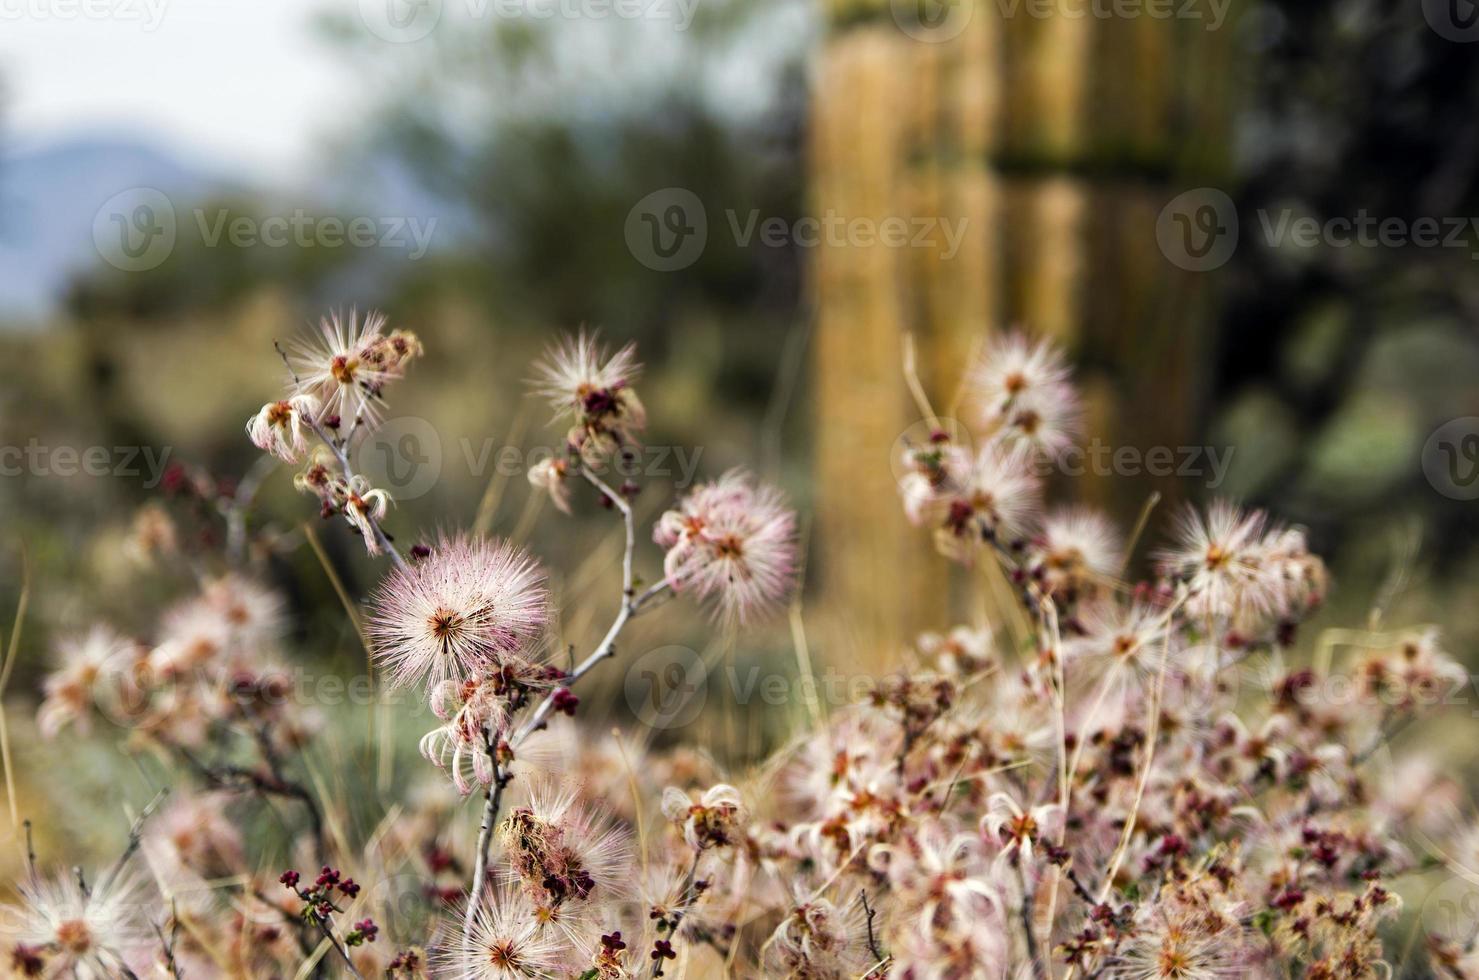 wilde Blumen im Saguaro-Nationalpark, Tucson, Arizona foto